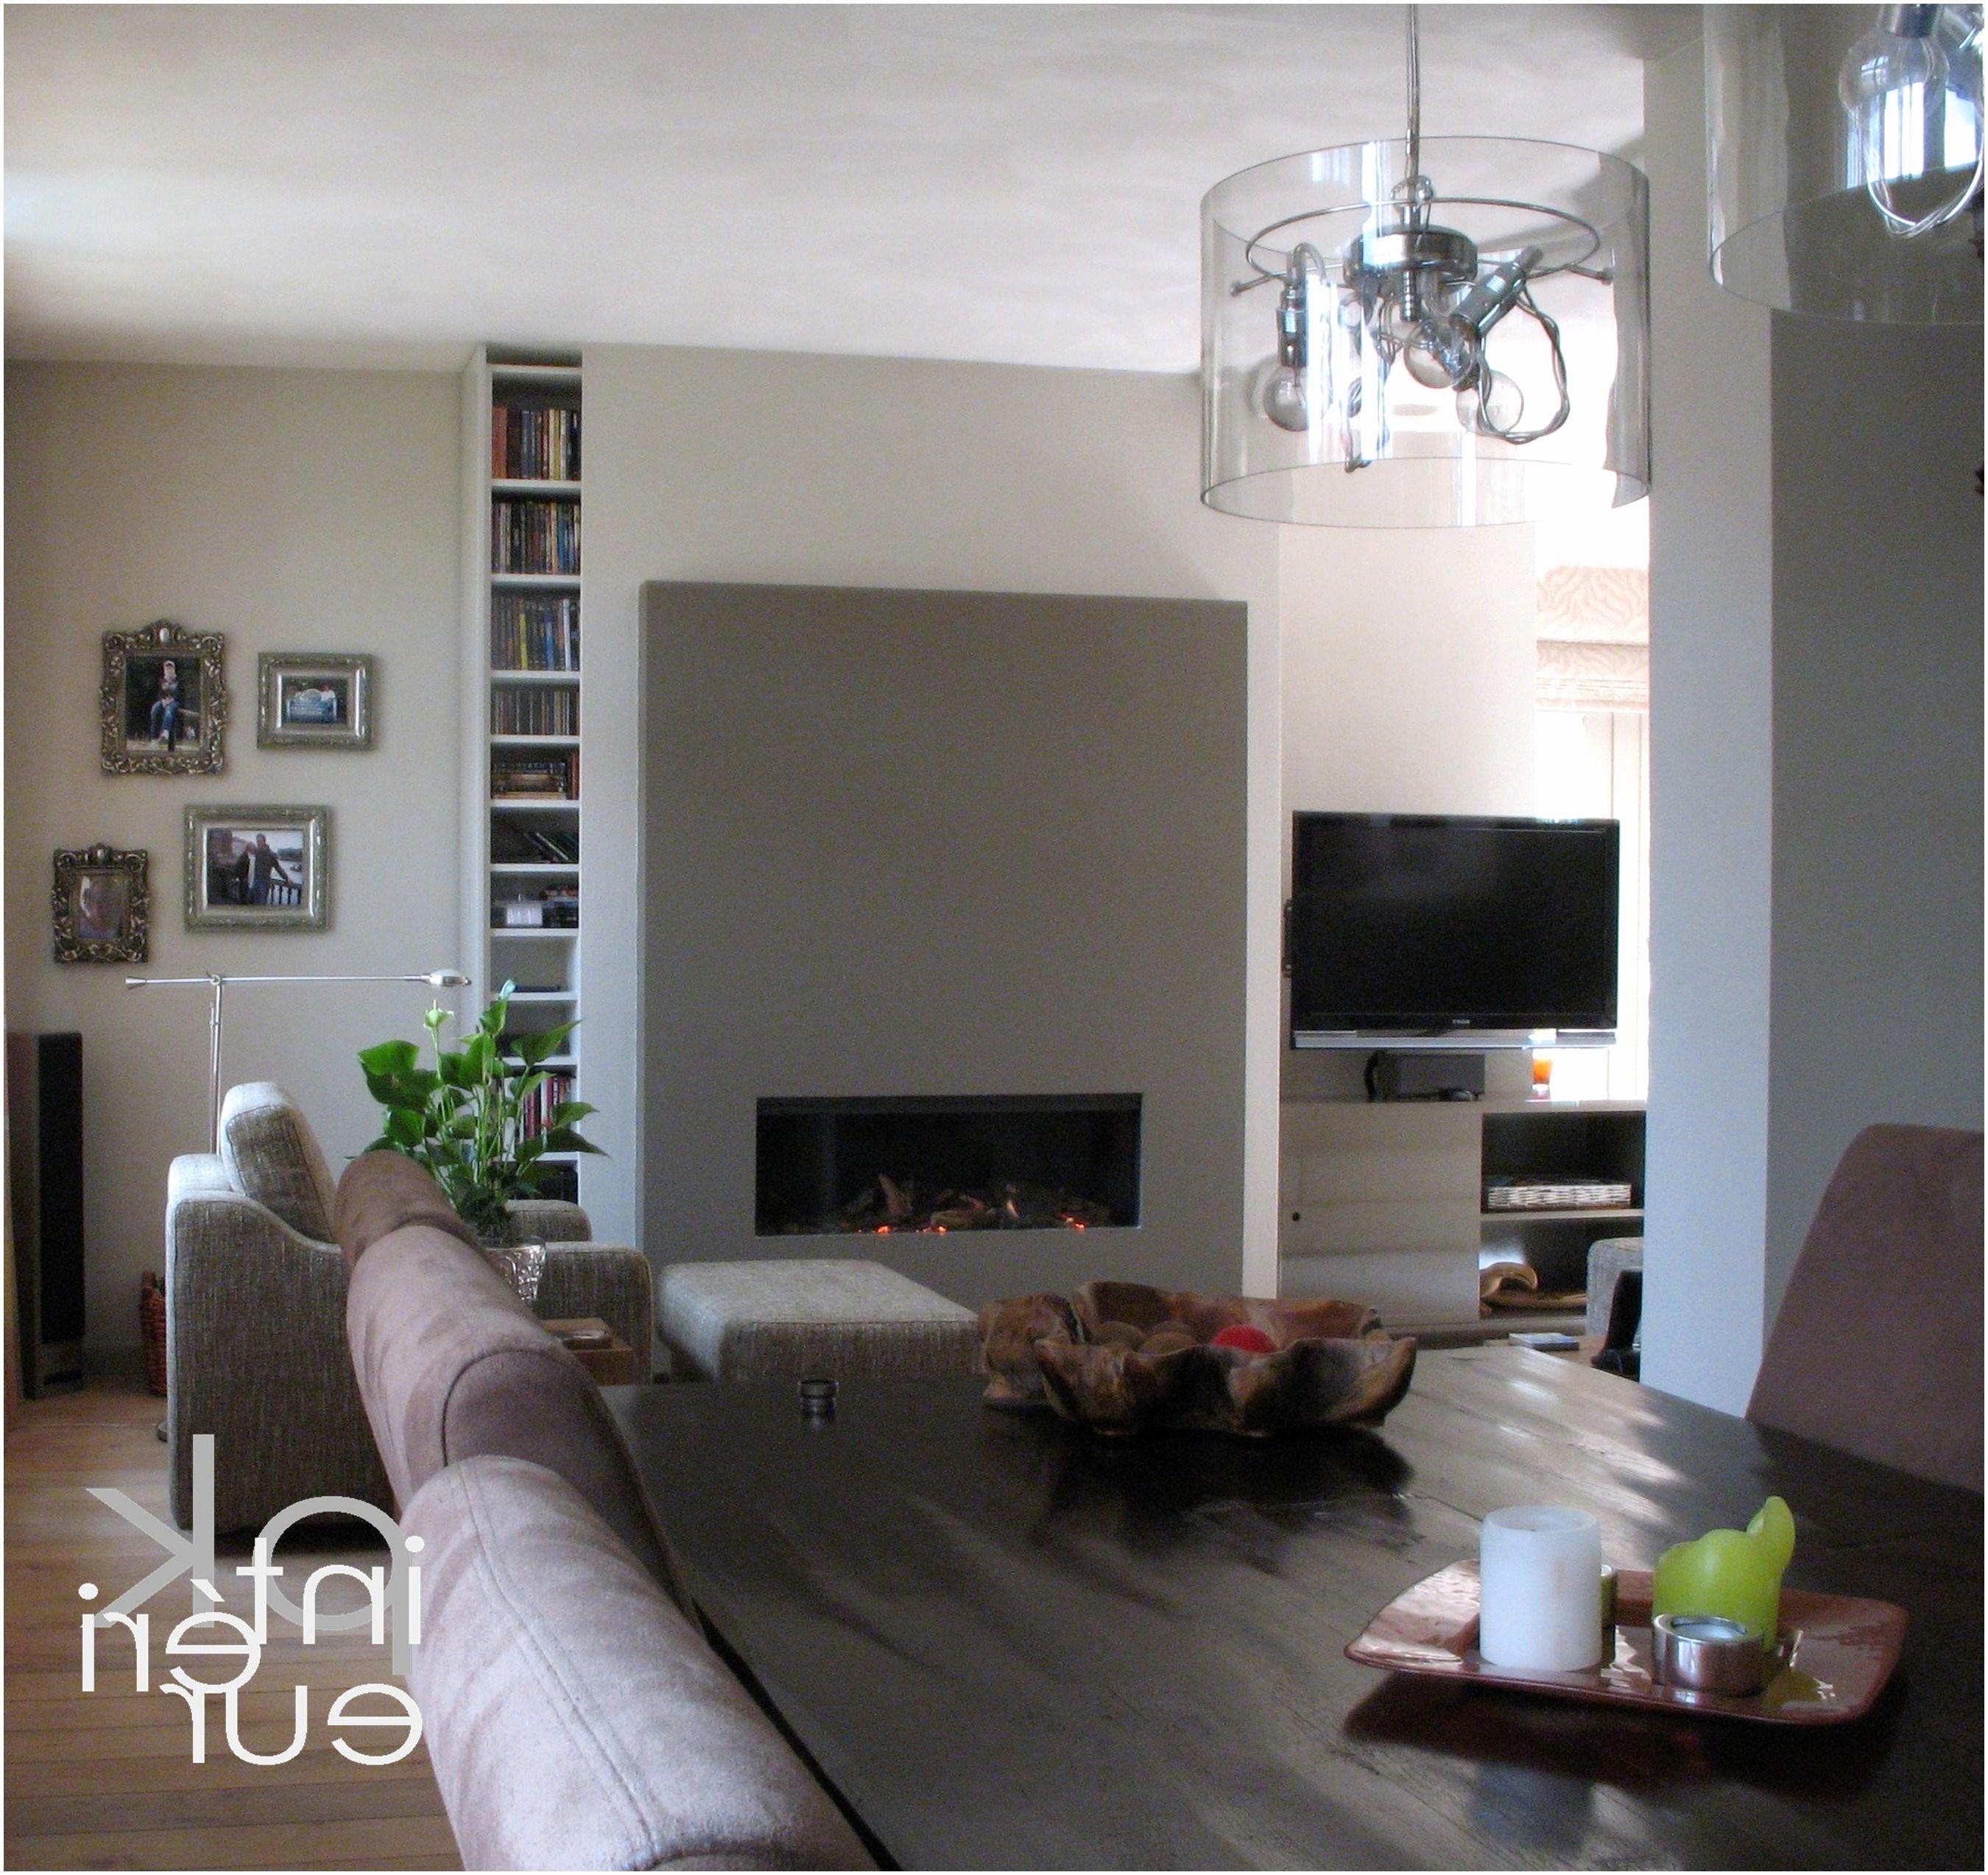 vente priv e decoration interieur design en image. Black Bedroom Furniture Sets. Home Design Ideas